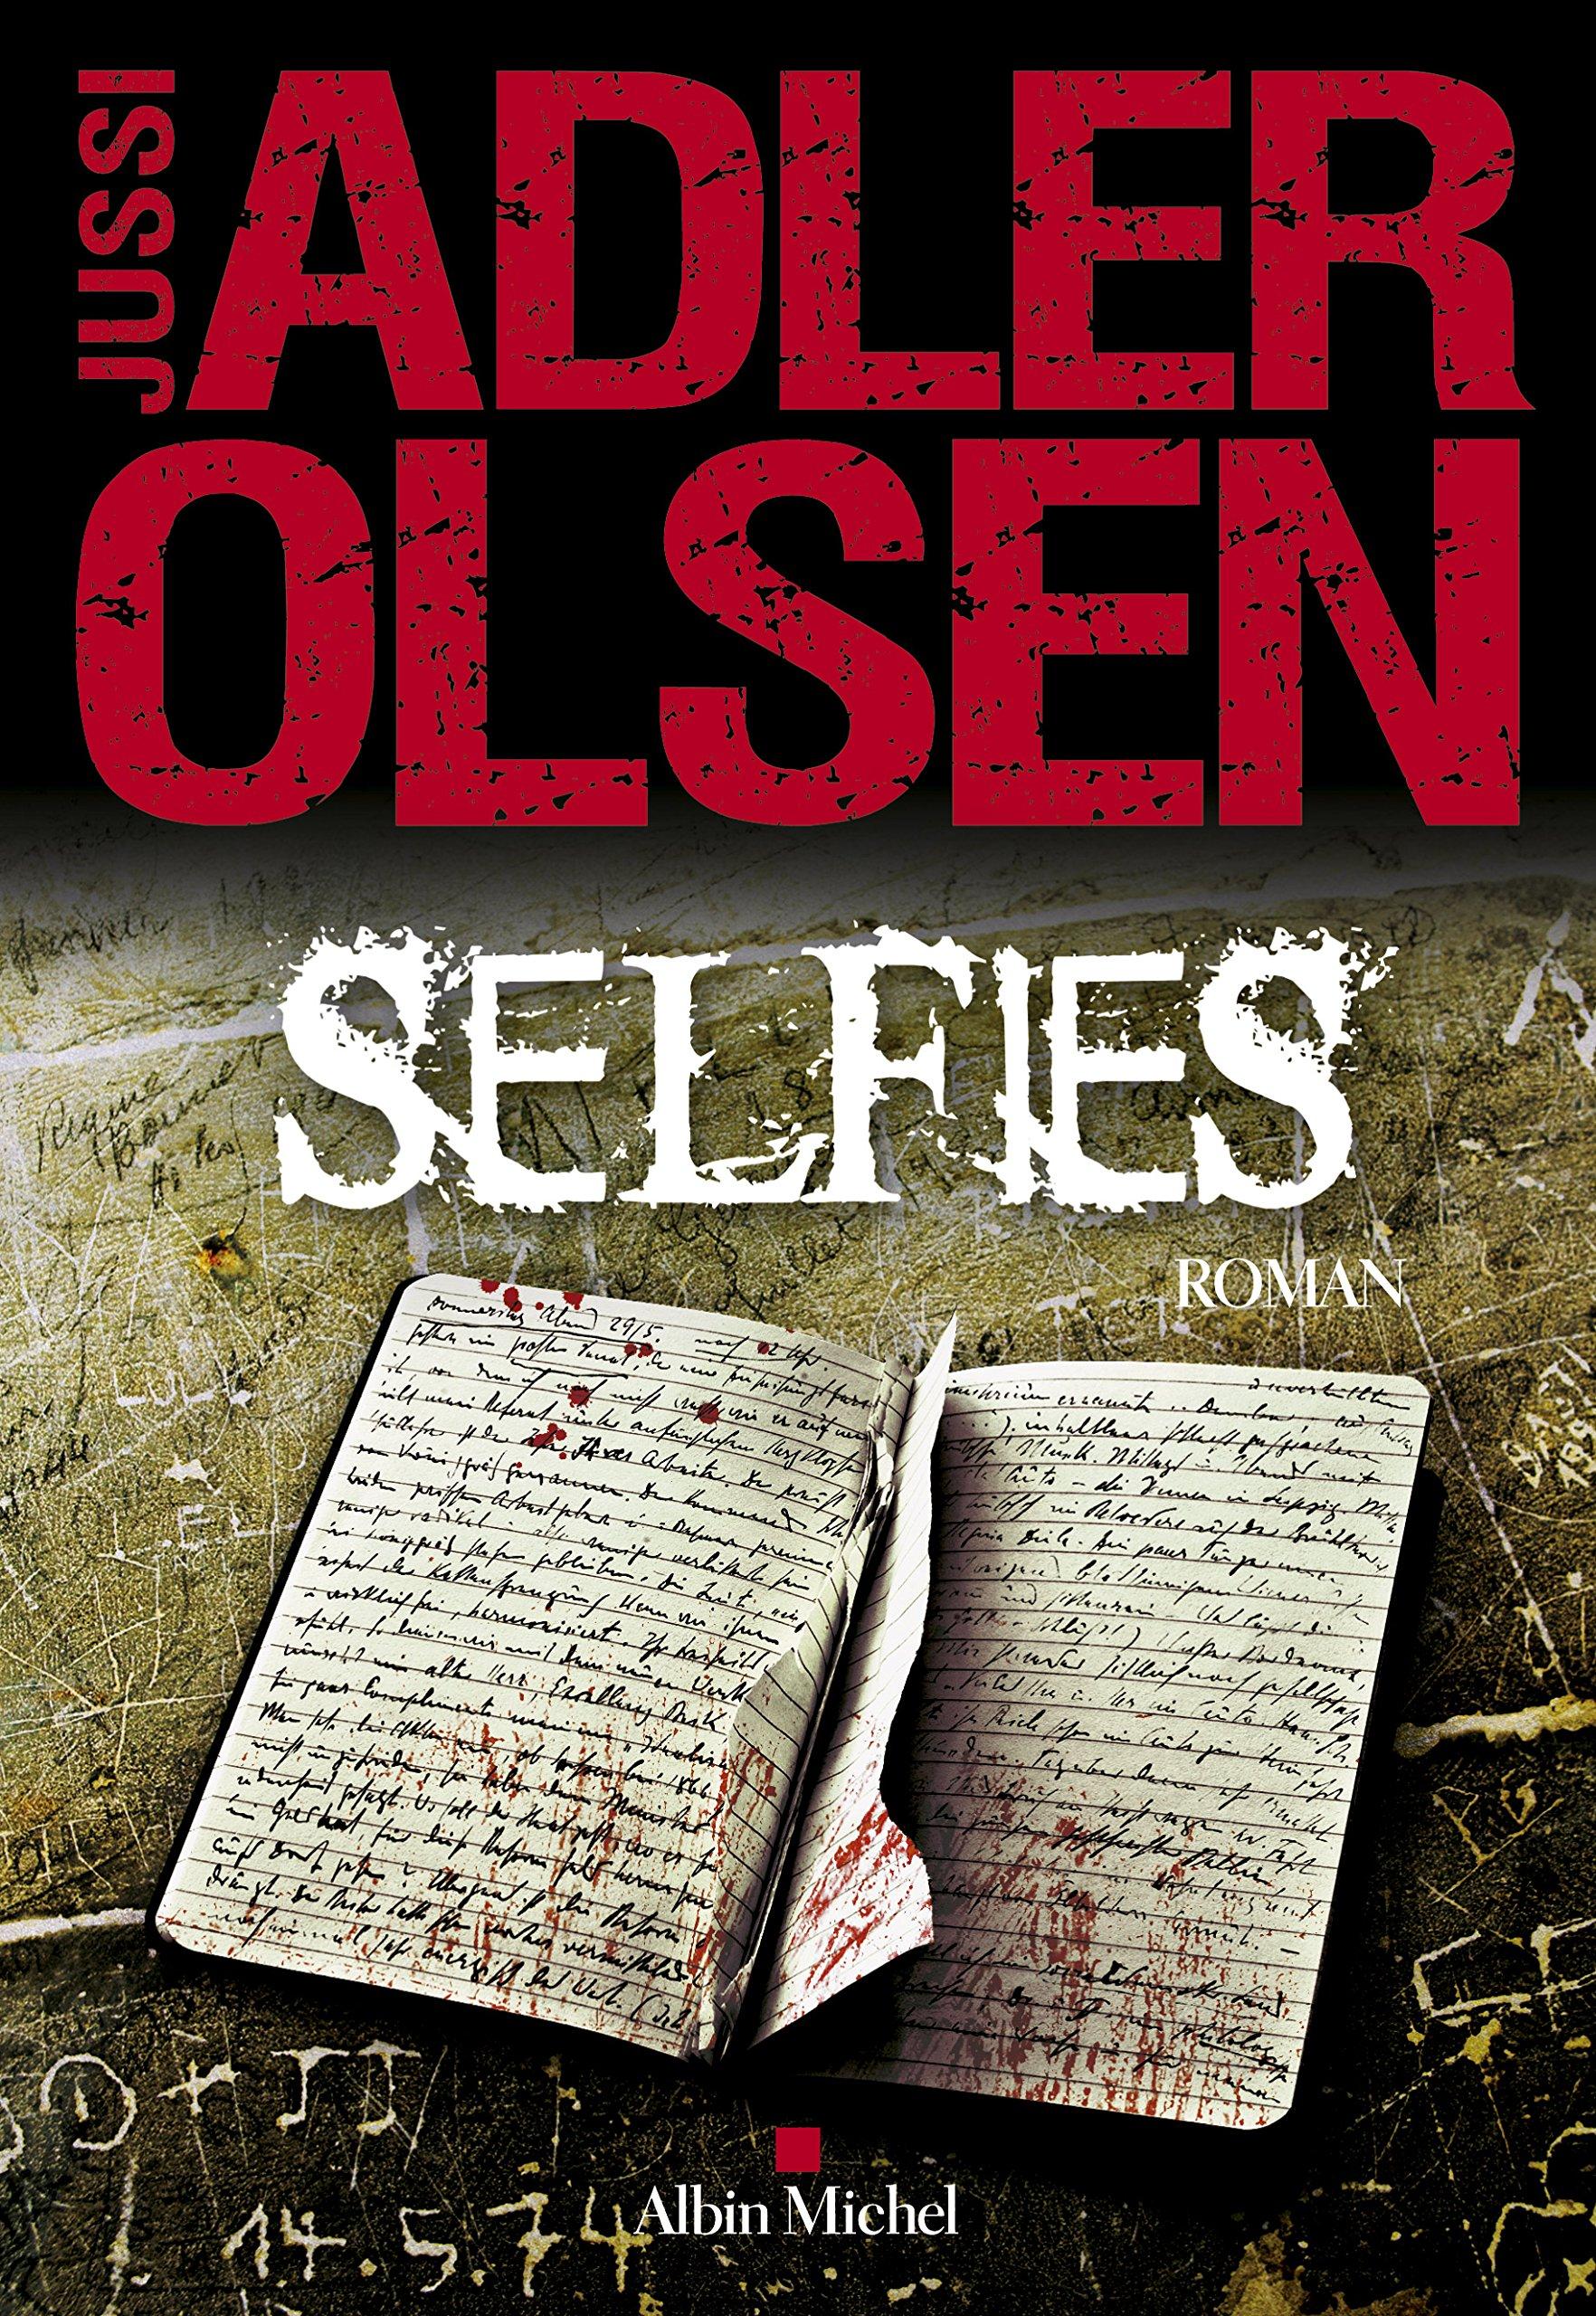 Jussi Adler-Olsen (2017) - Selfies